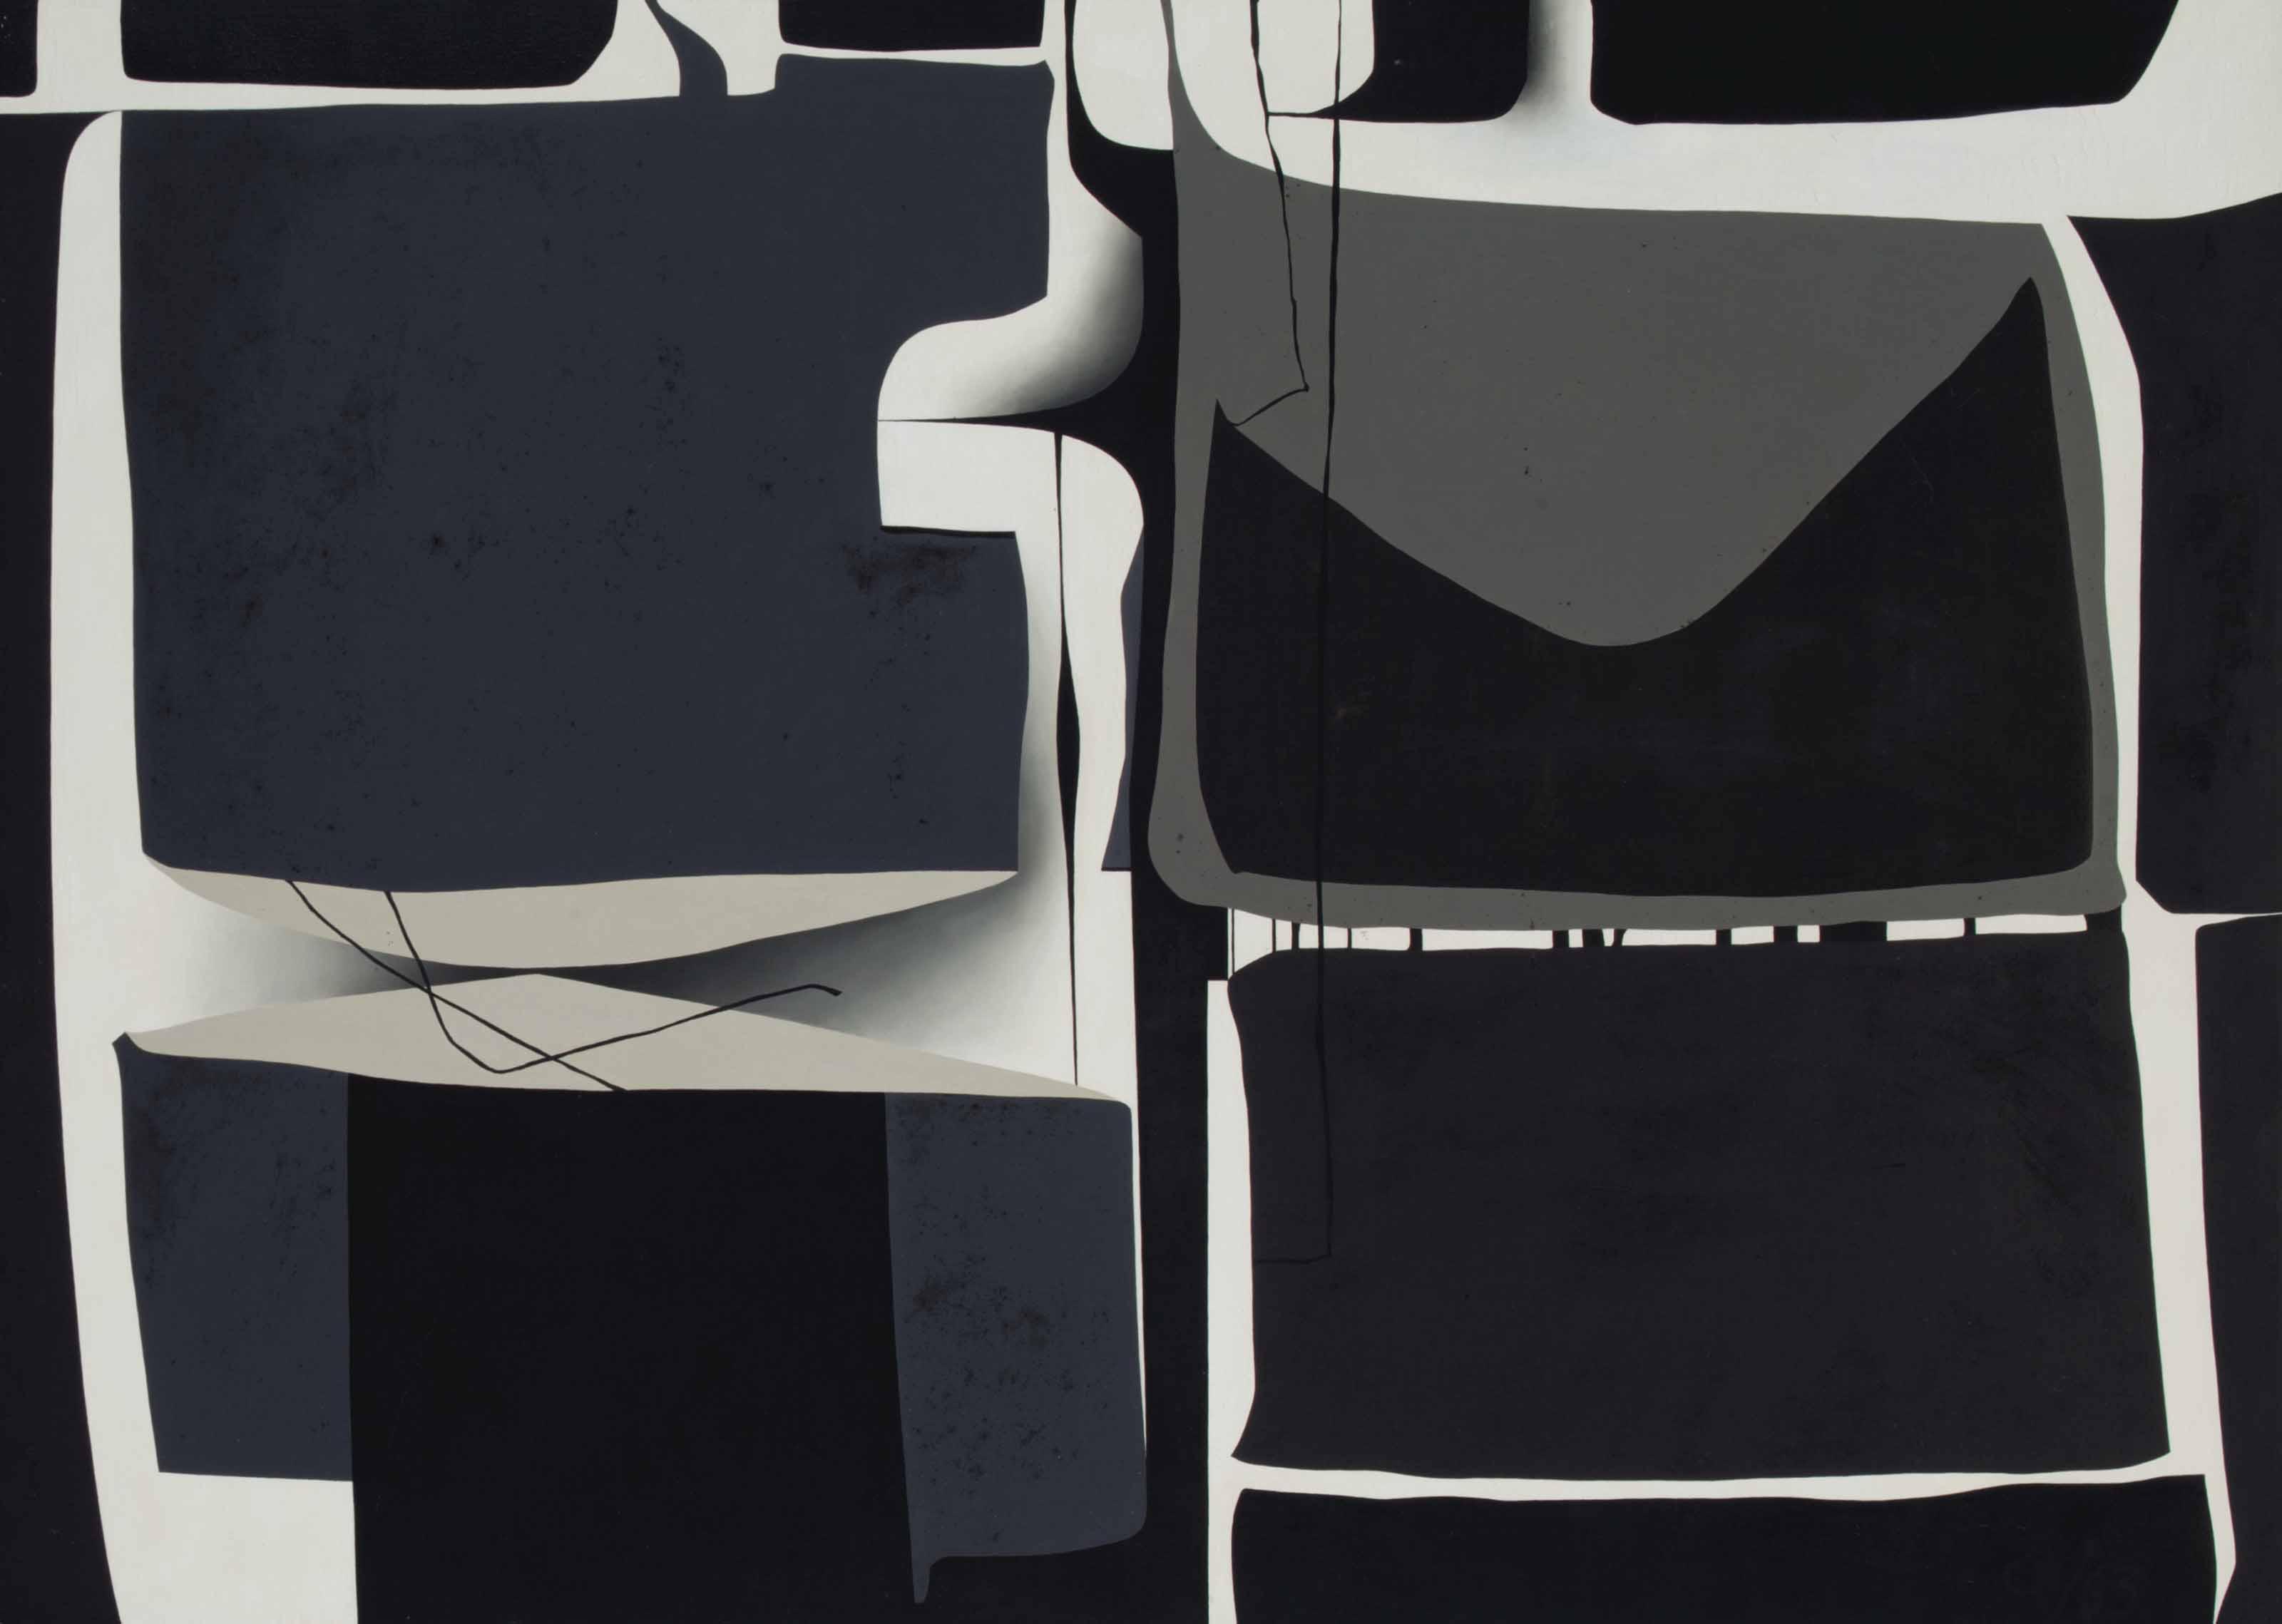 Painting-1963 (II)